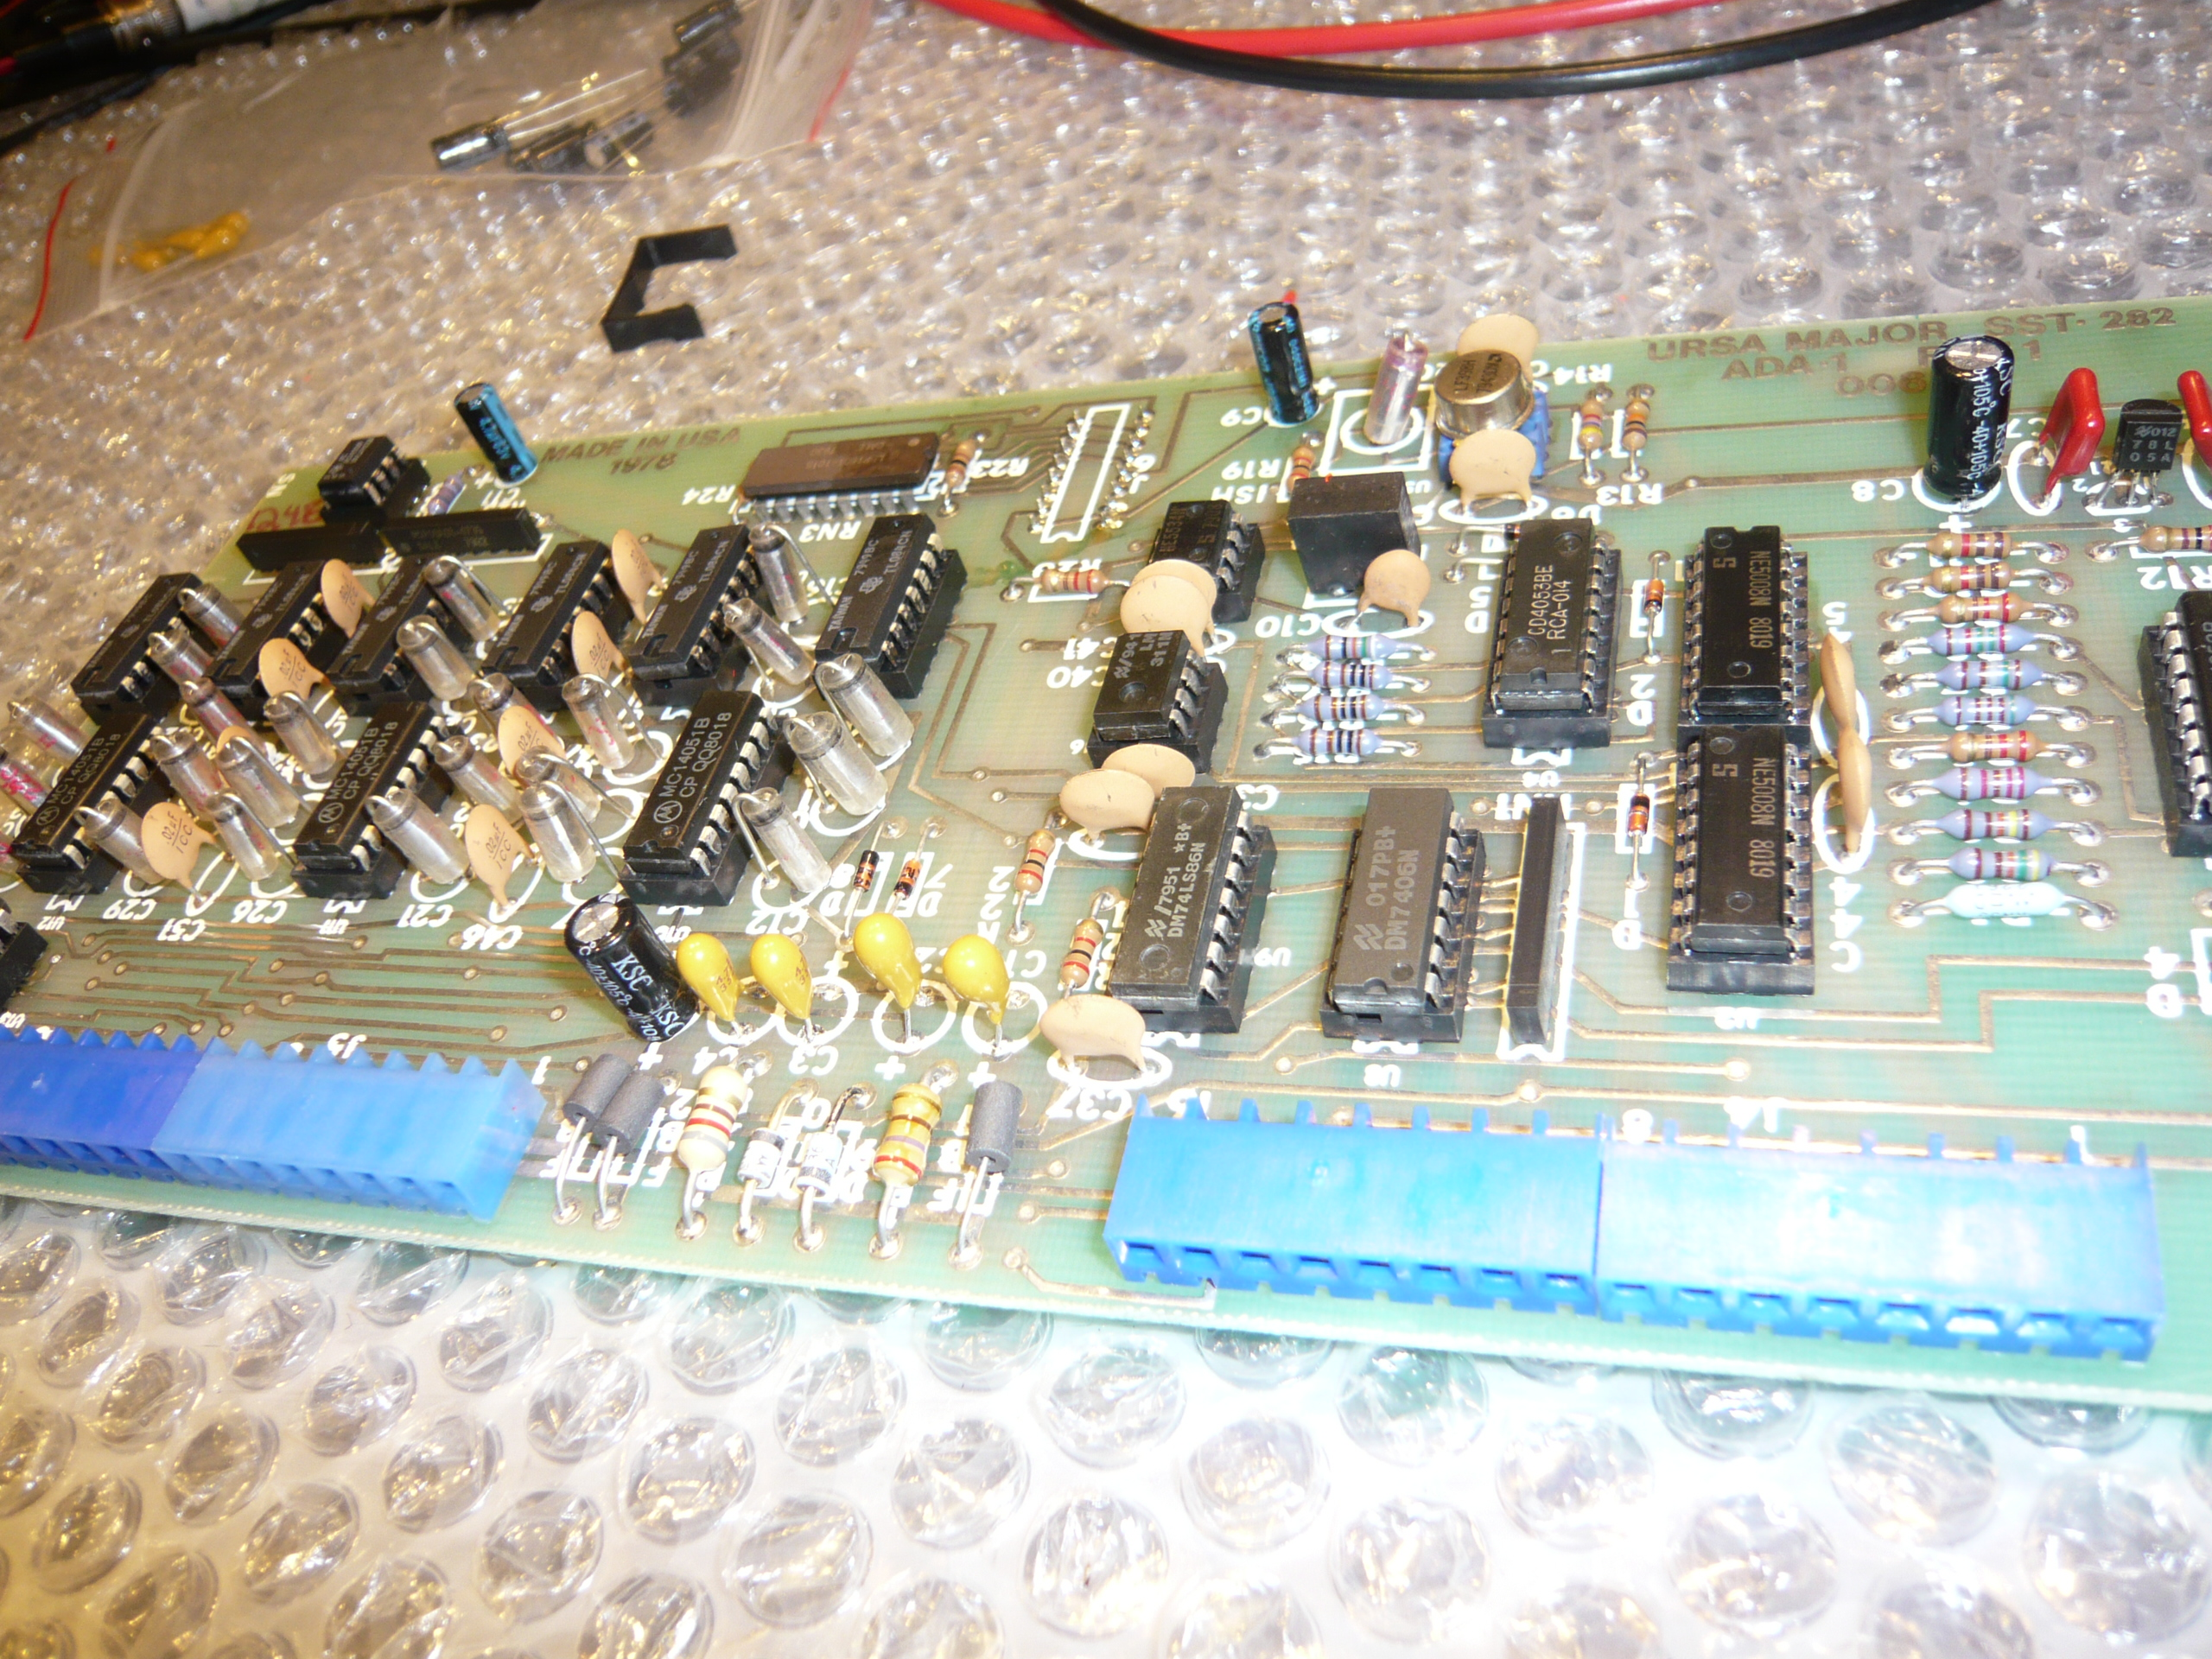 Ursa Major Space Station Sst282 Obsoletetechnology